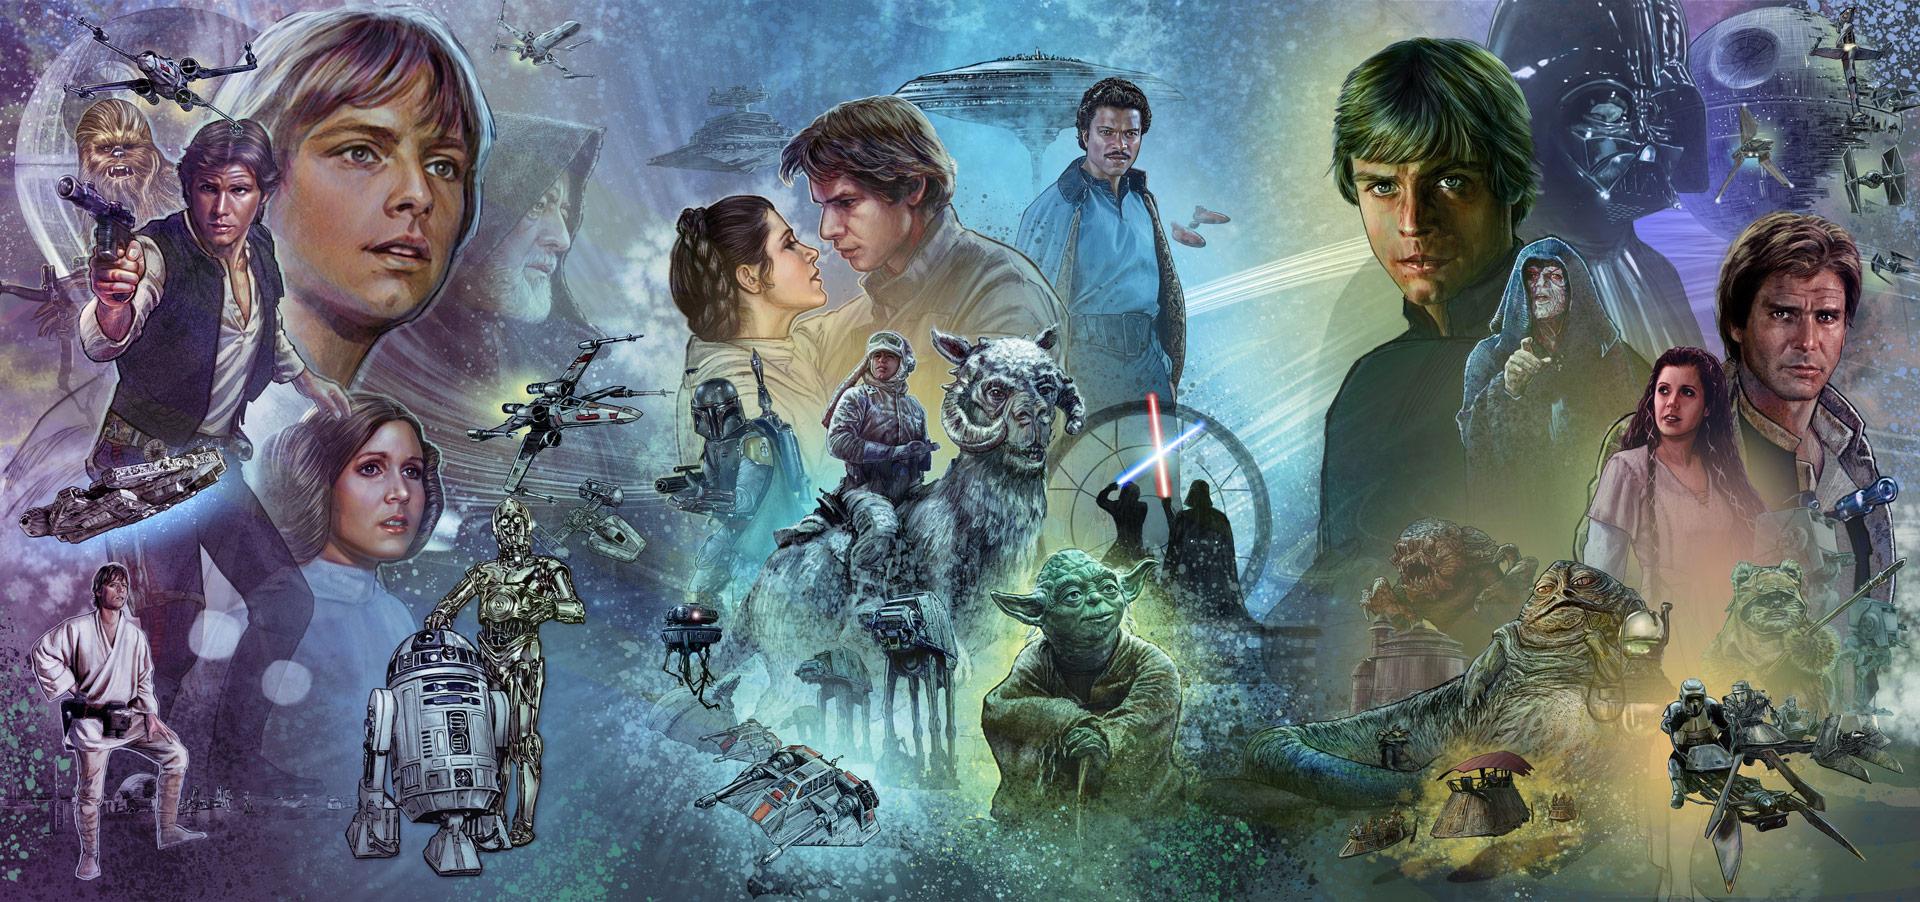 Star Wars Original Trilogy Wallpaper Posted By Ethan Peltier